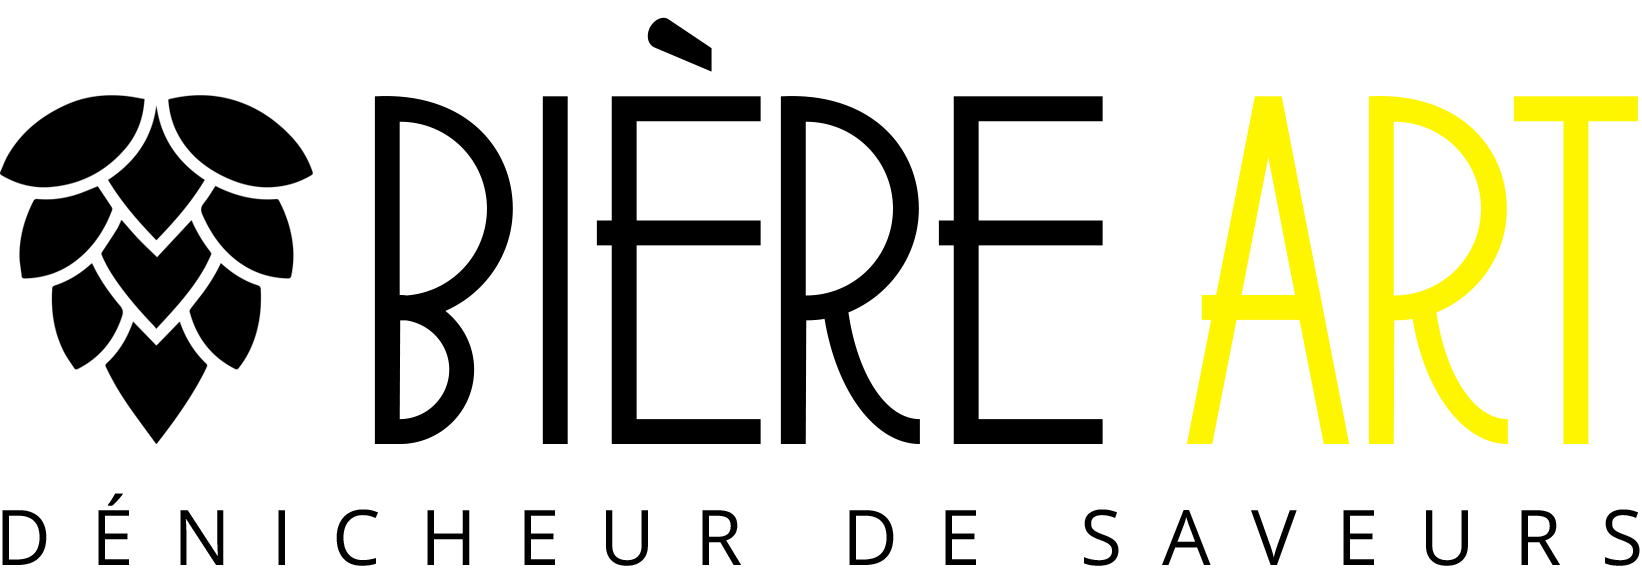 logo-Biere-Art-black